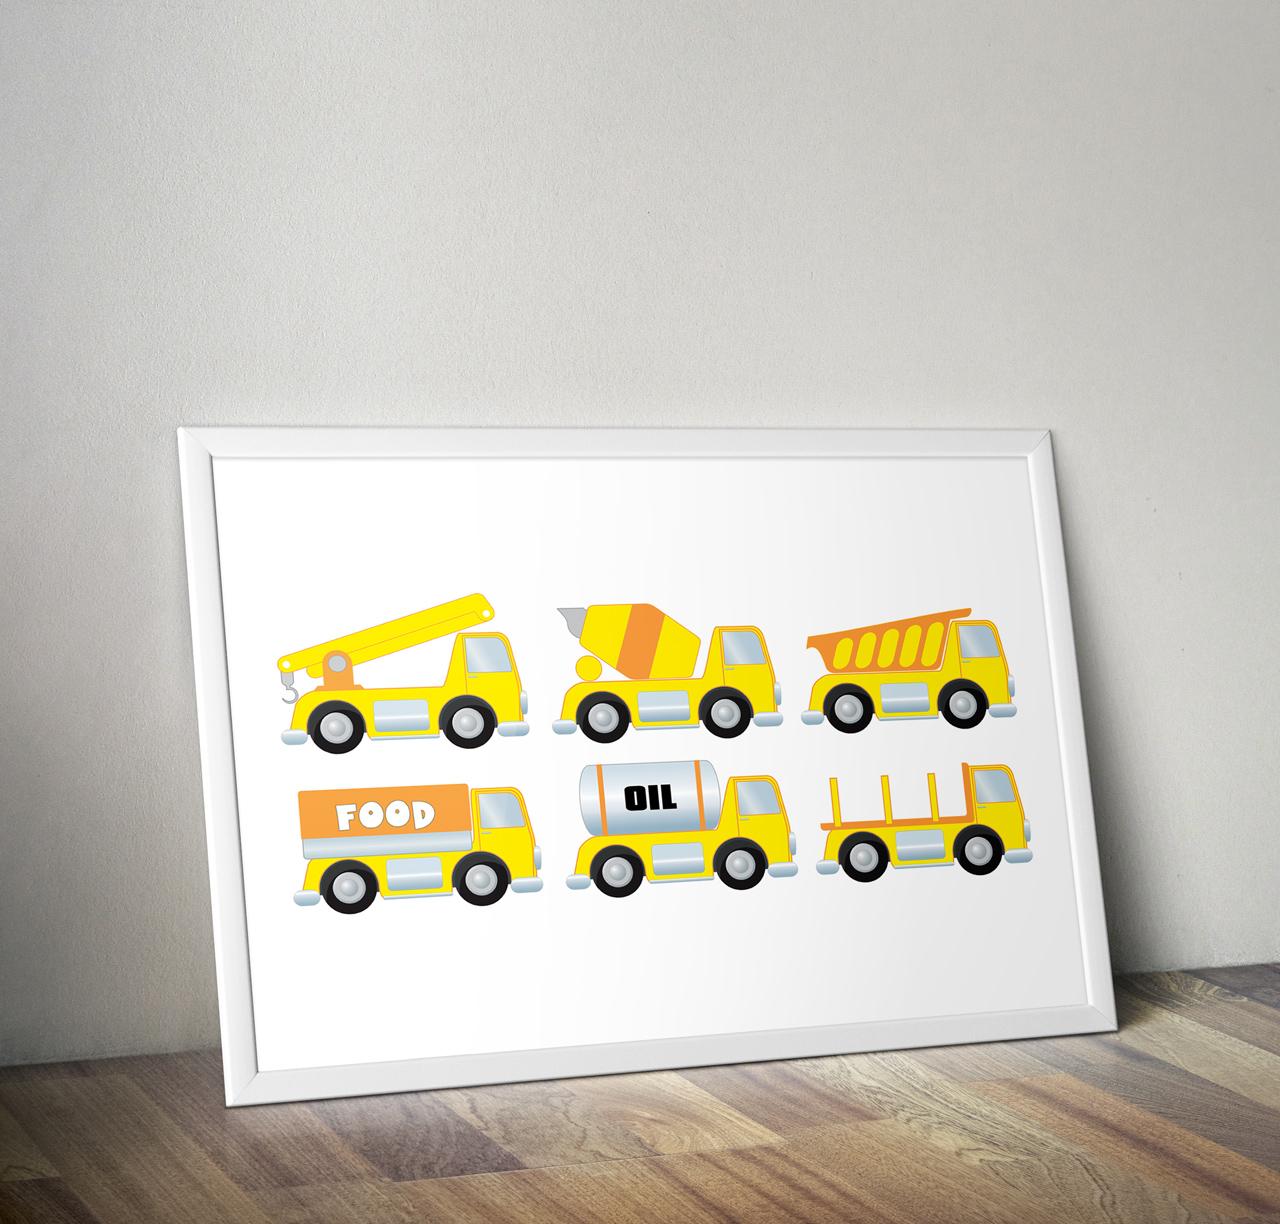 Construction clipart, construction truck, dump truck clip art, truck  clipart, cars clipart, printable, construction digital.